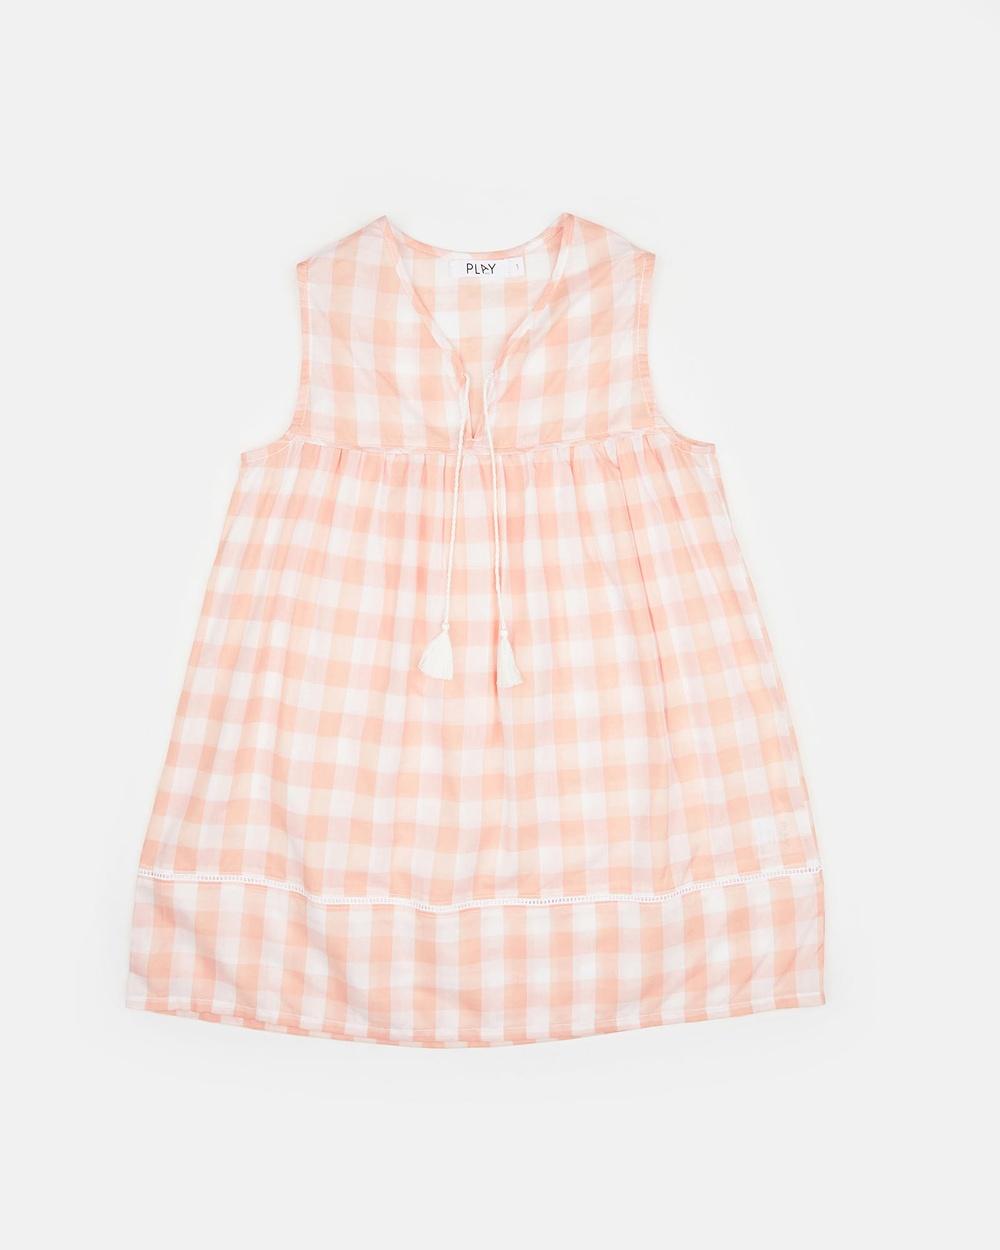 Photo of PLAY etc Pink Inga Dress - buy PLAY etc dresses on sale online